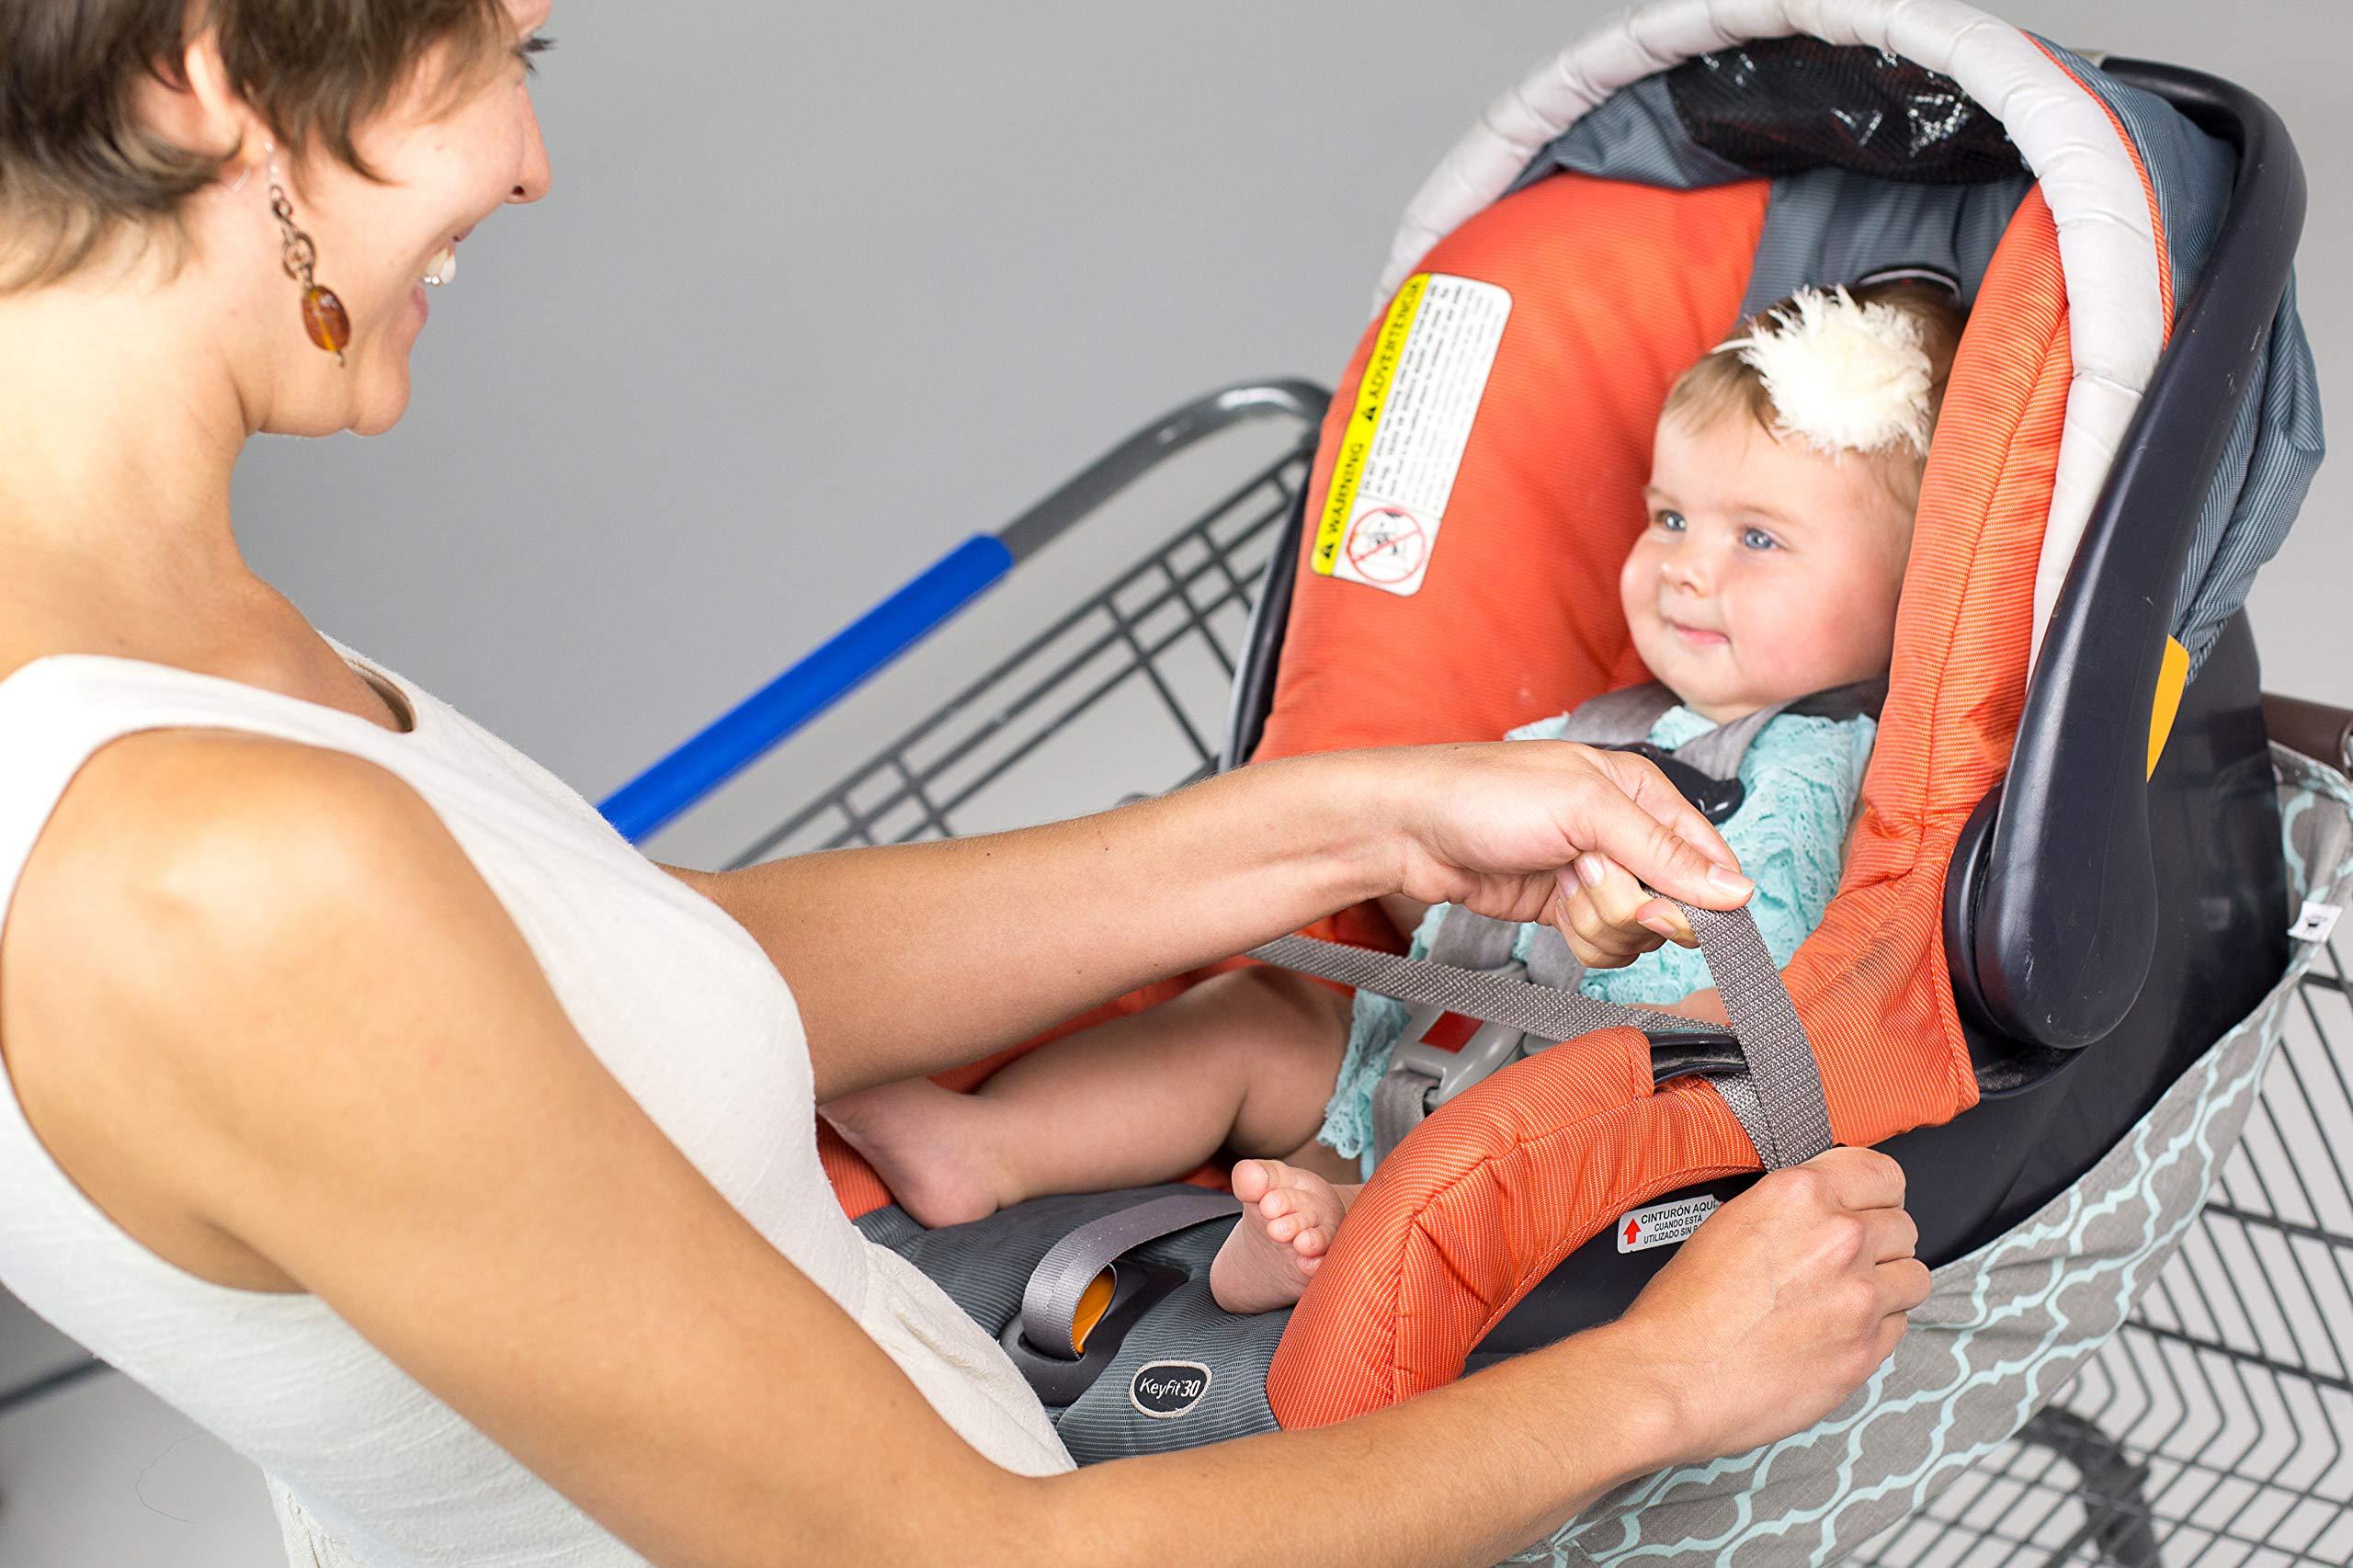 BINXY BABY Shopping Cart Hammock | The Original | Ergonomic Infant Carrier + Positioner by Binxy Baby (Image #8)